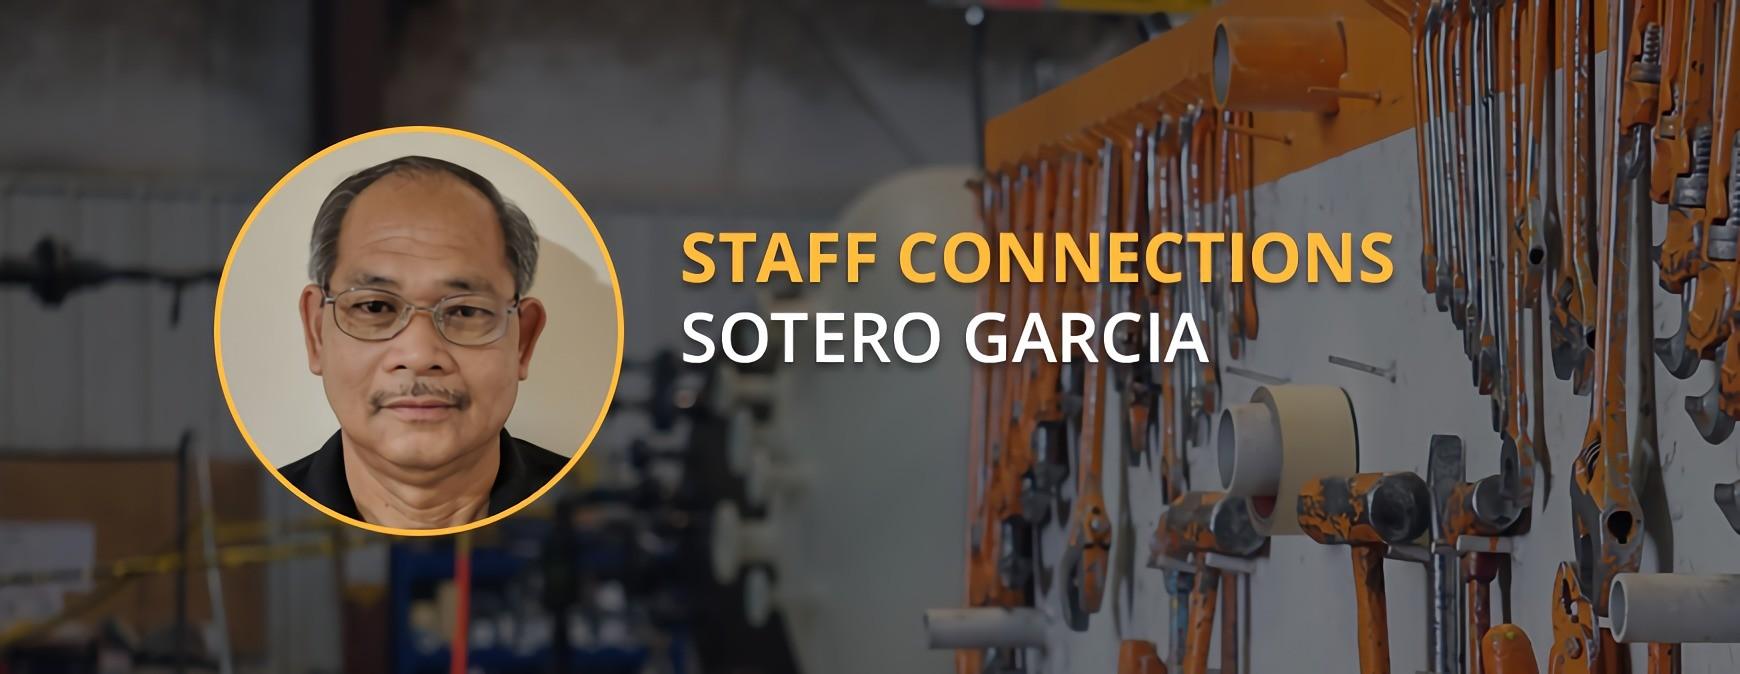 Sotero Garcia